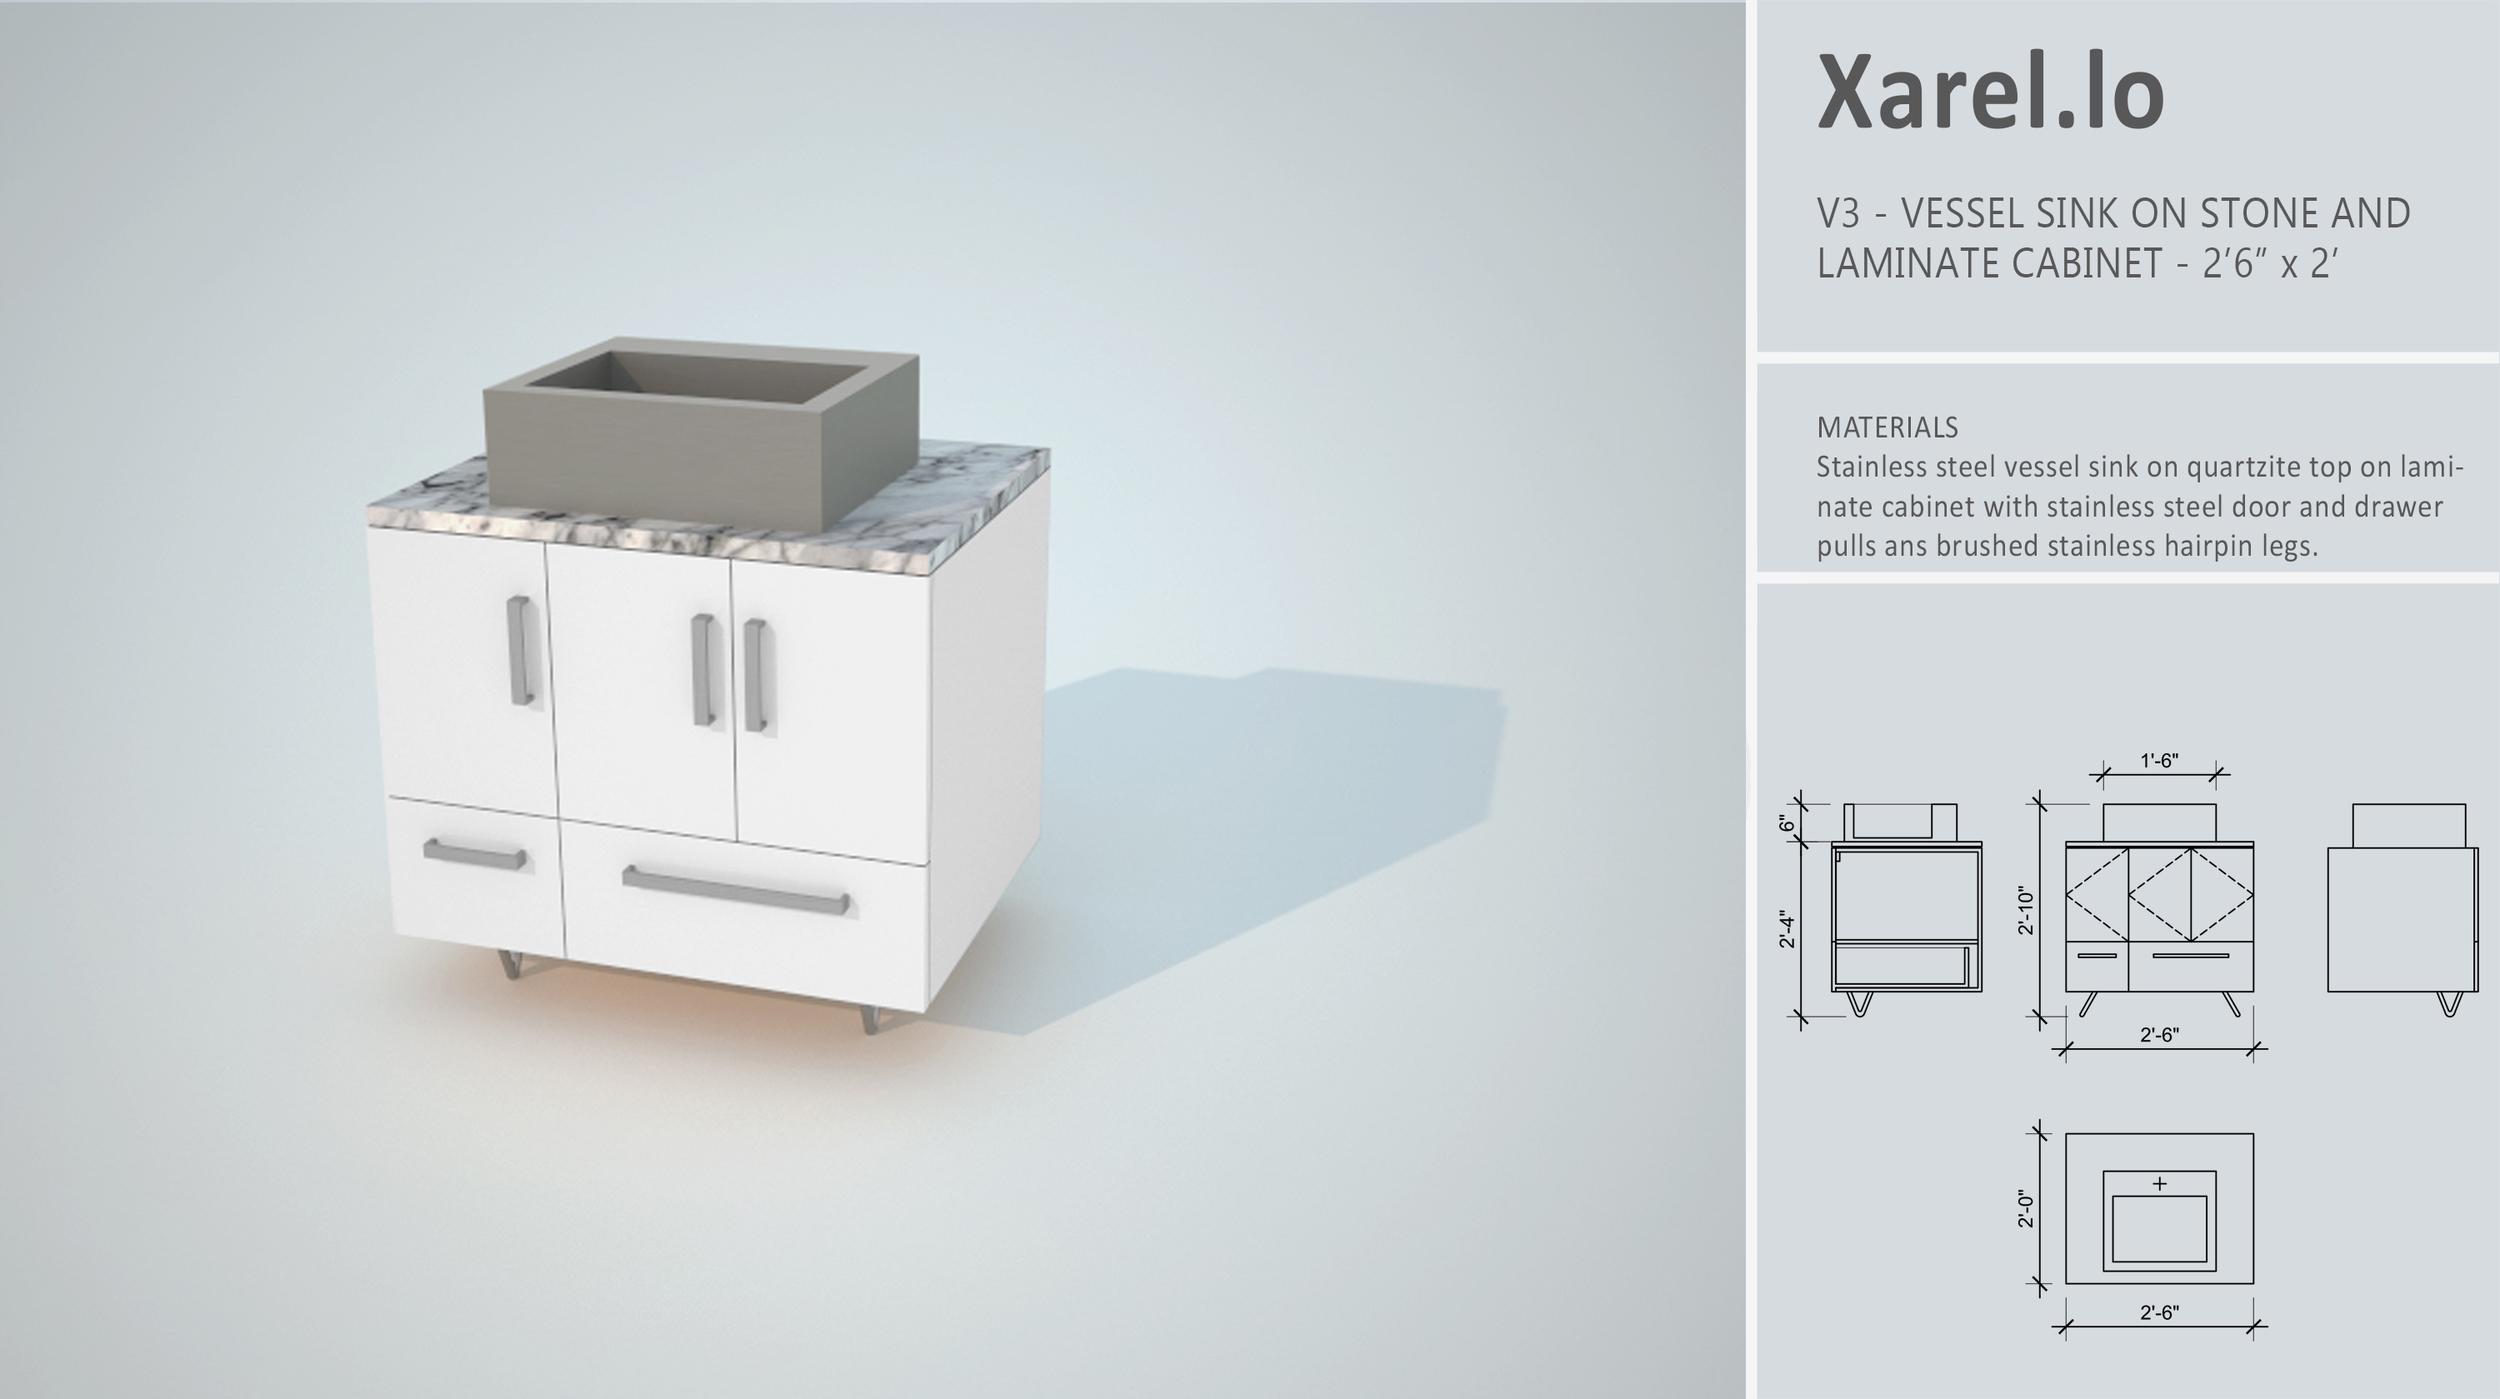 TECHNICAL SHEET VANITY V3 -XAREL.LO.jpg